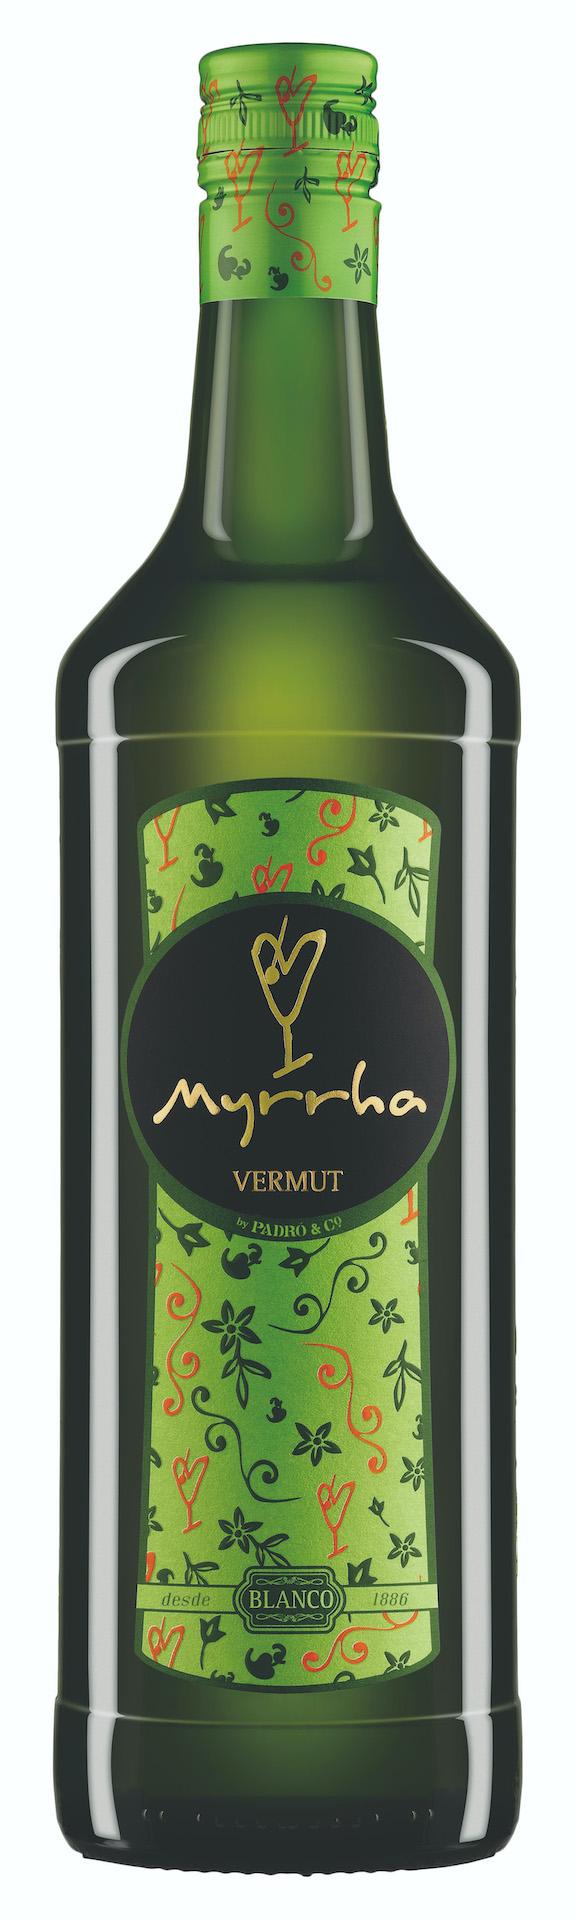 Myrrha Blanco | Padró & Co.  - Winexfood